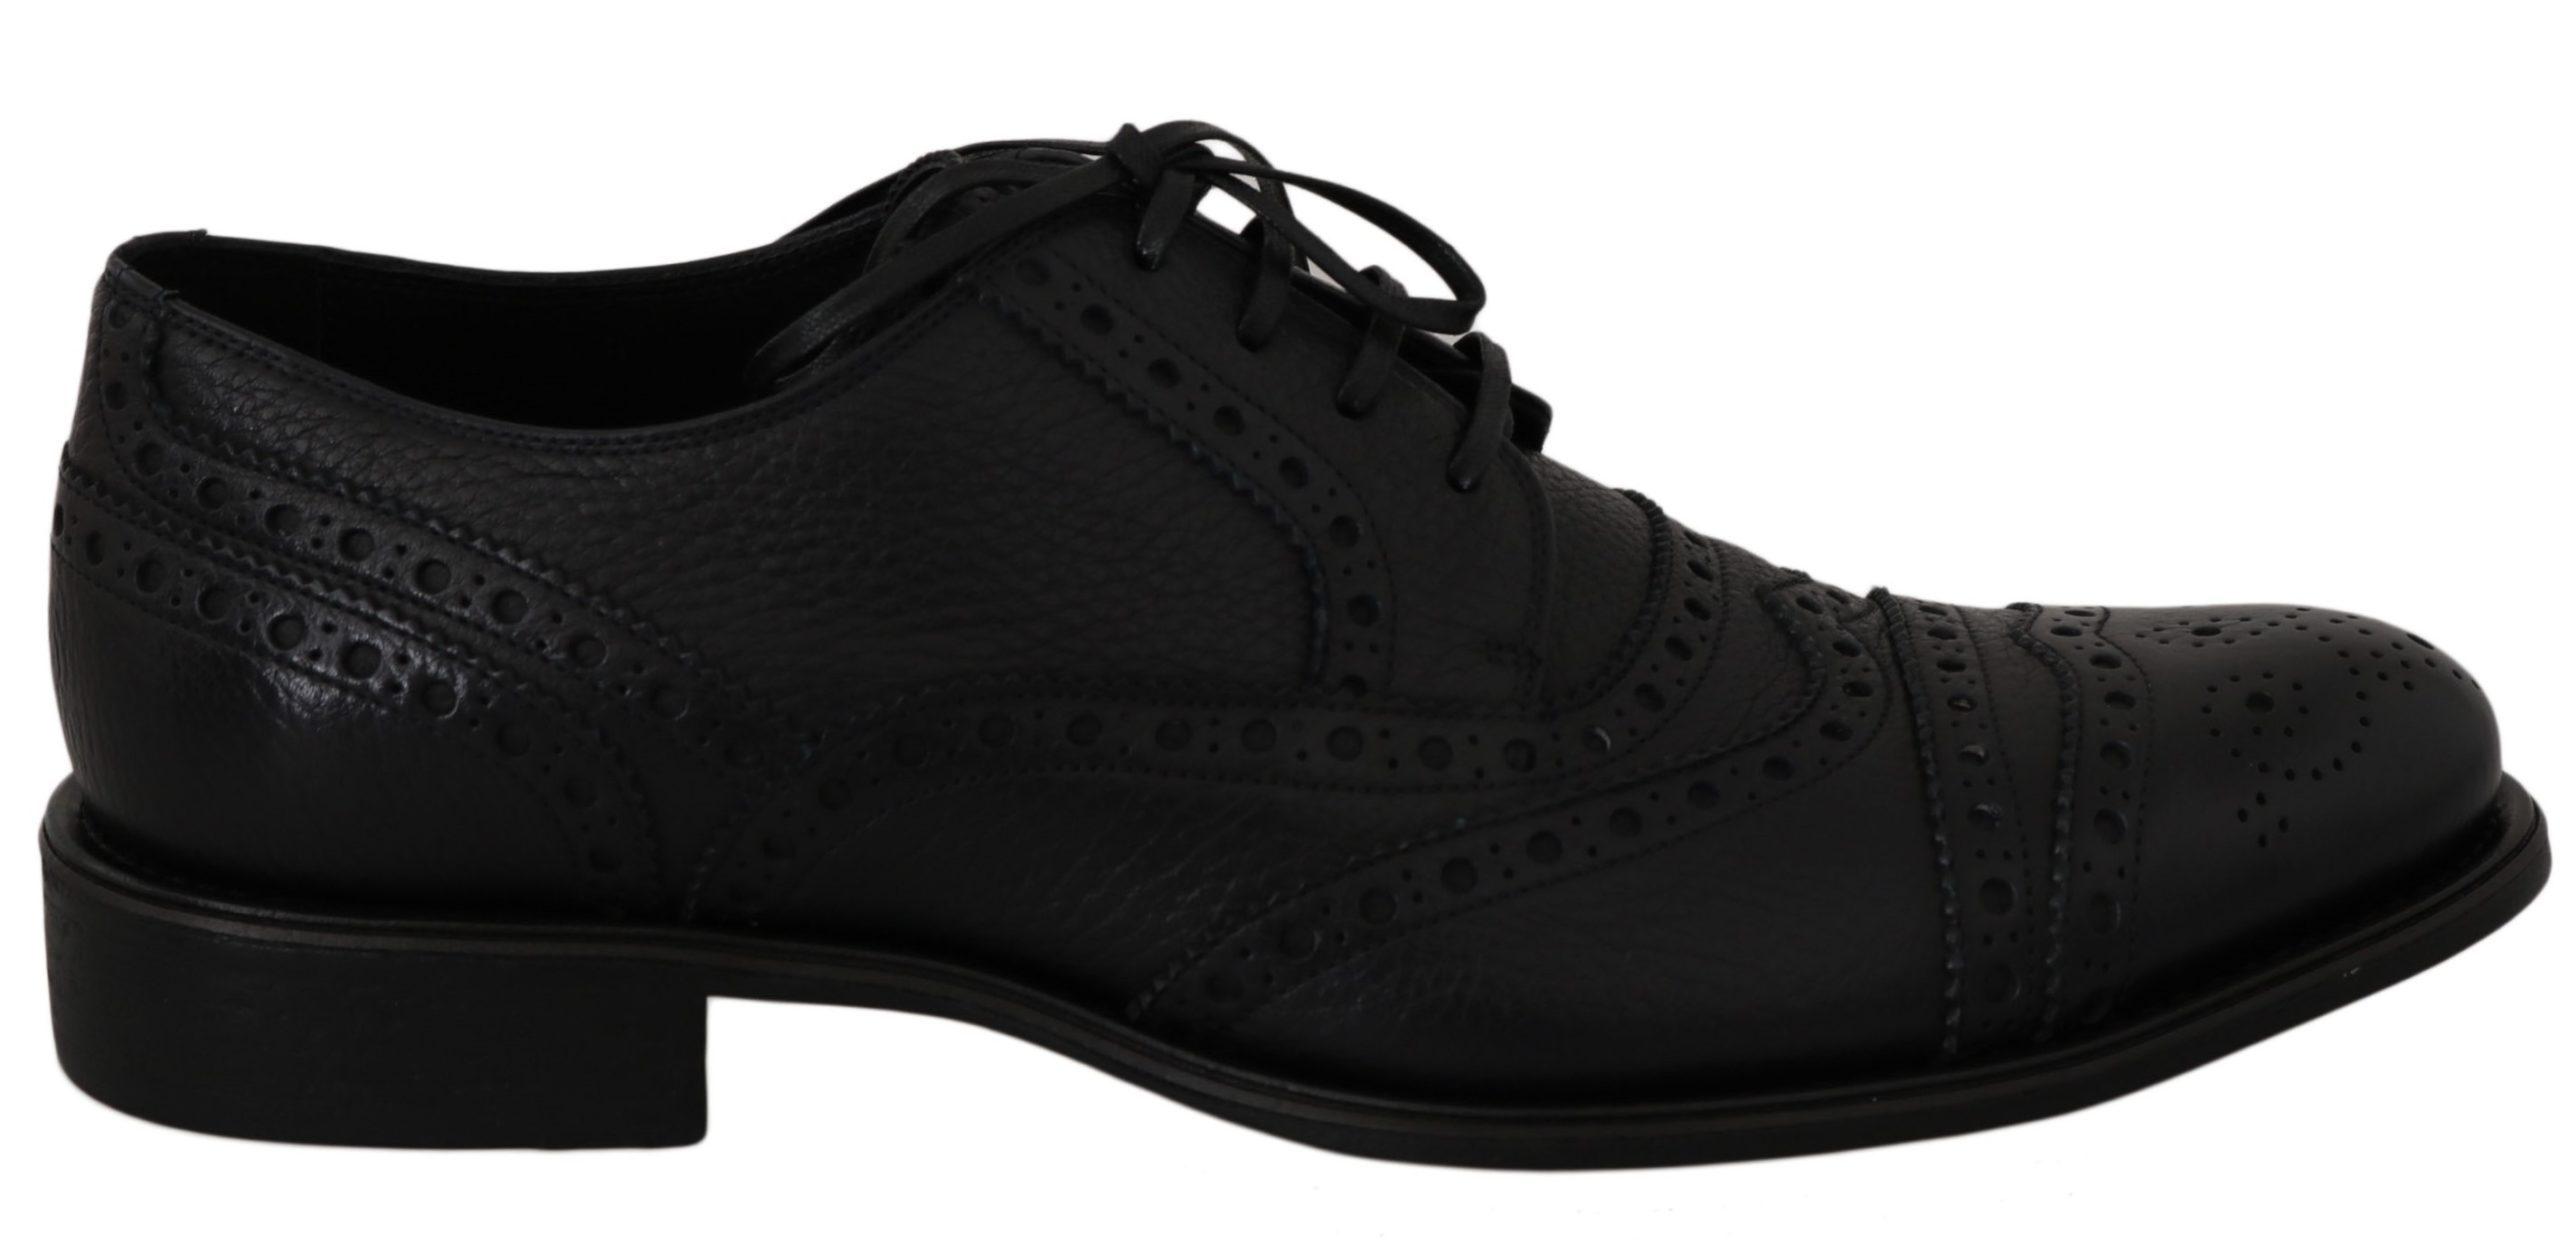 Dolce & Gabbana Men's Shoes Blue MV2364 - EU39/US6